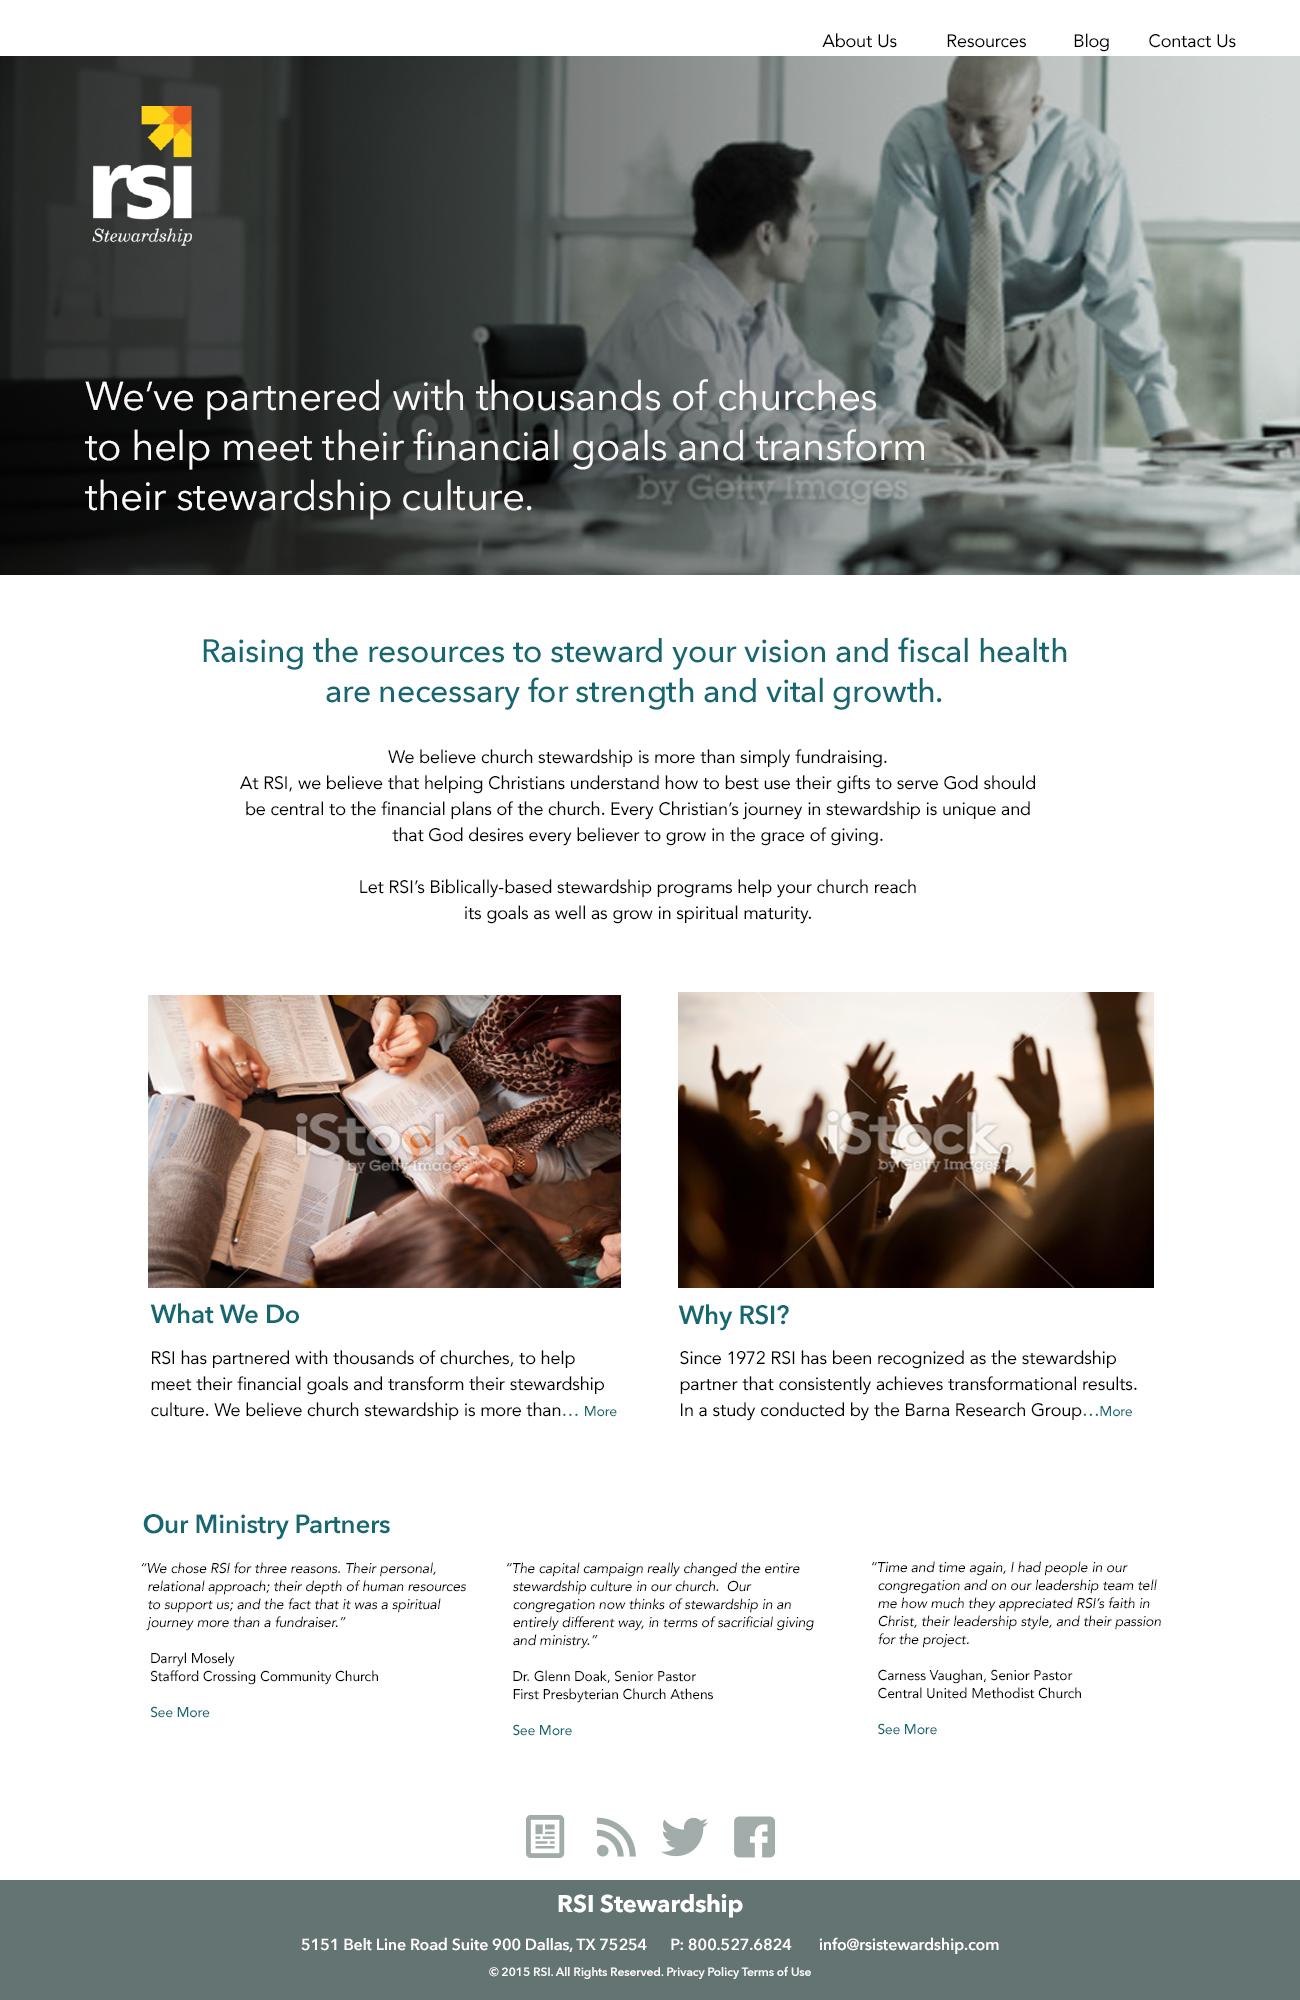 RSI Stewardship Website Re-brand Concept